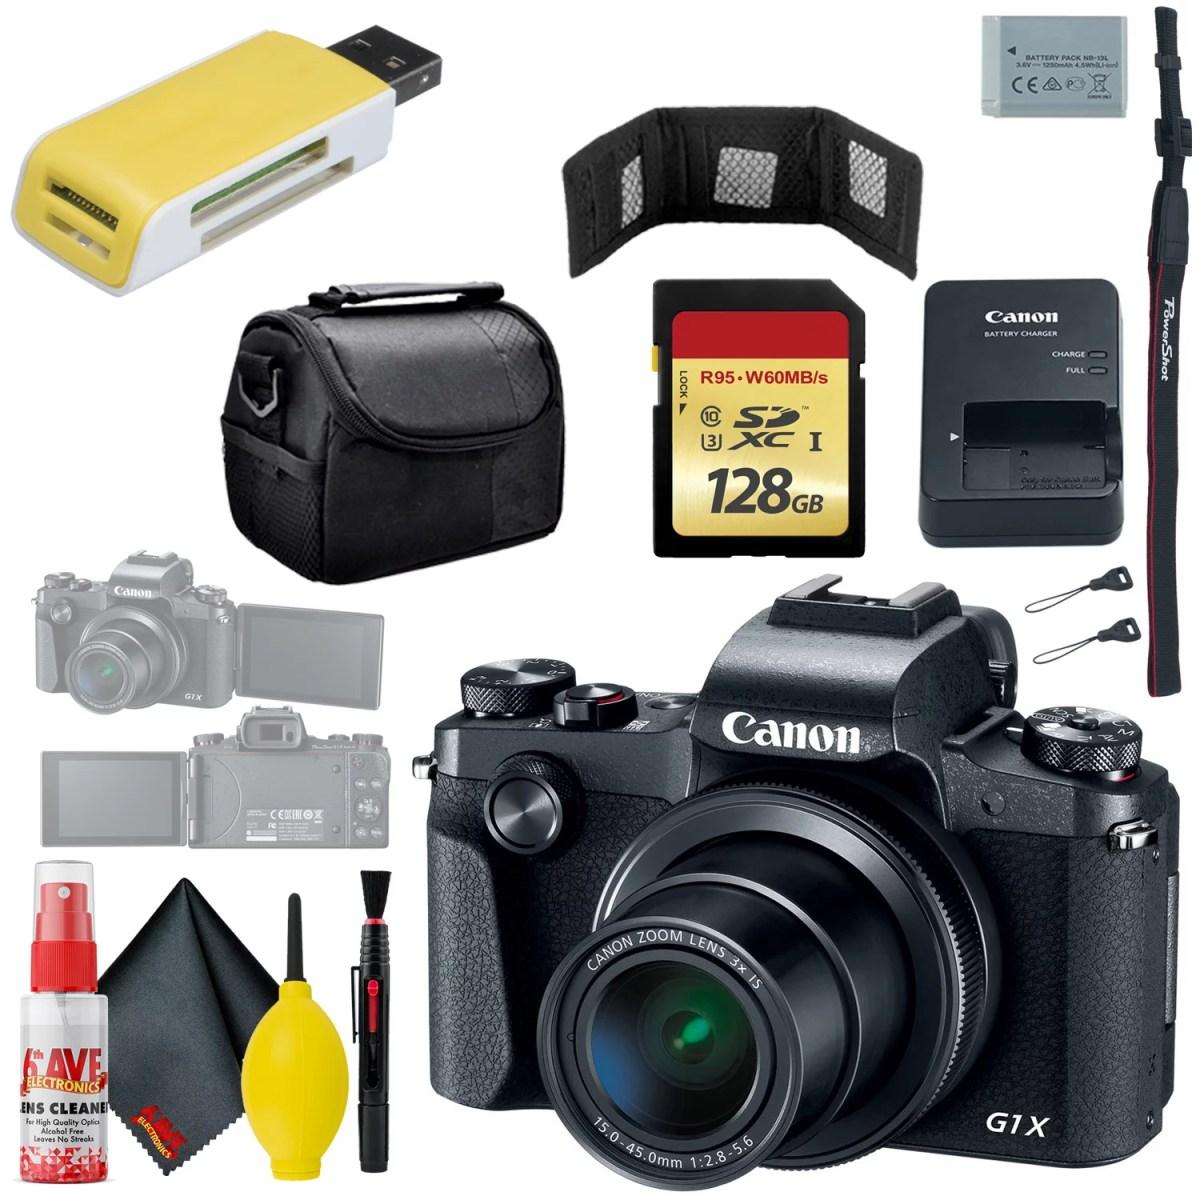 Canon PowerShot G1 X Mark III Digital Camera & 128GB MicroSD & Carrying Case